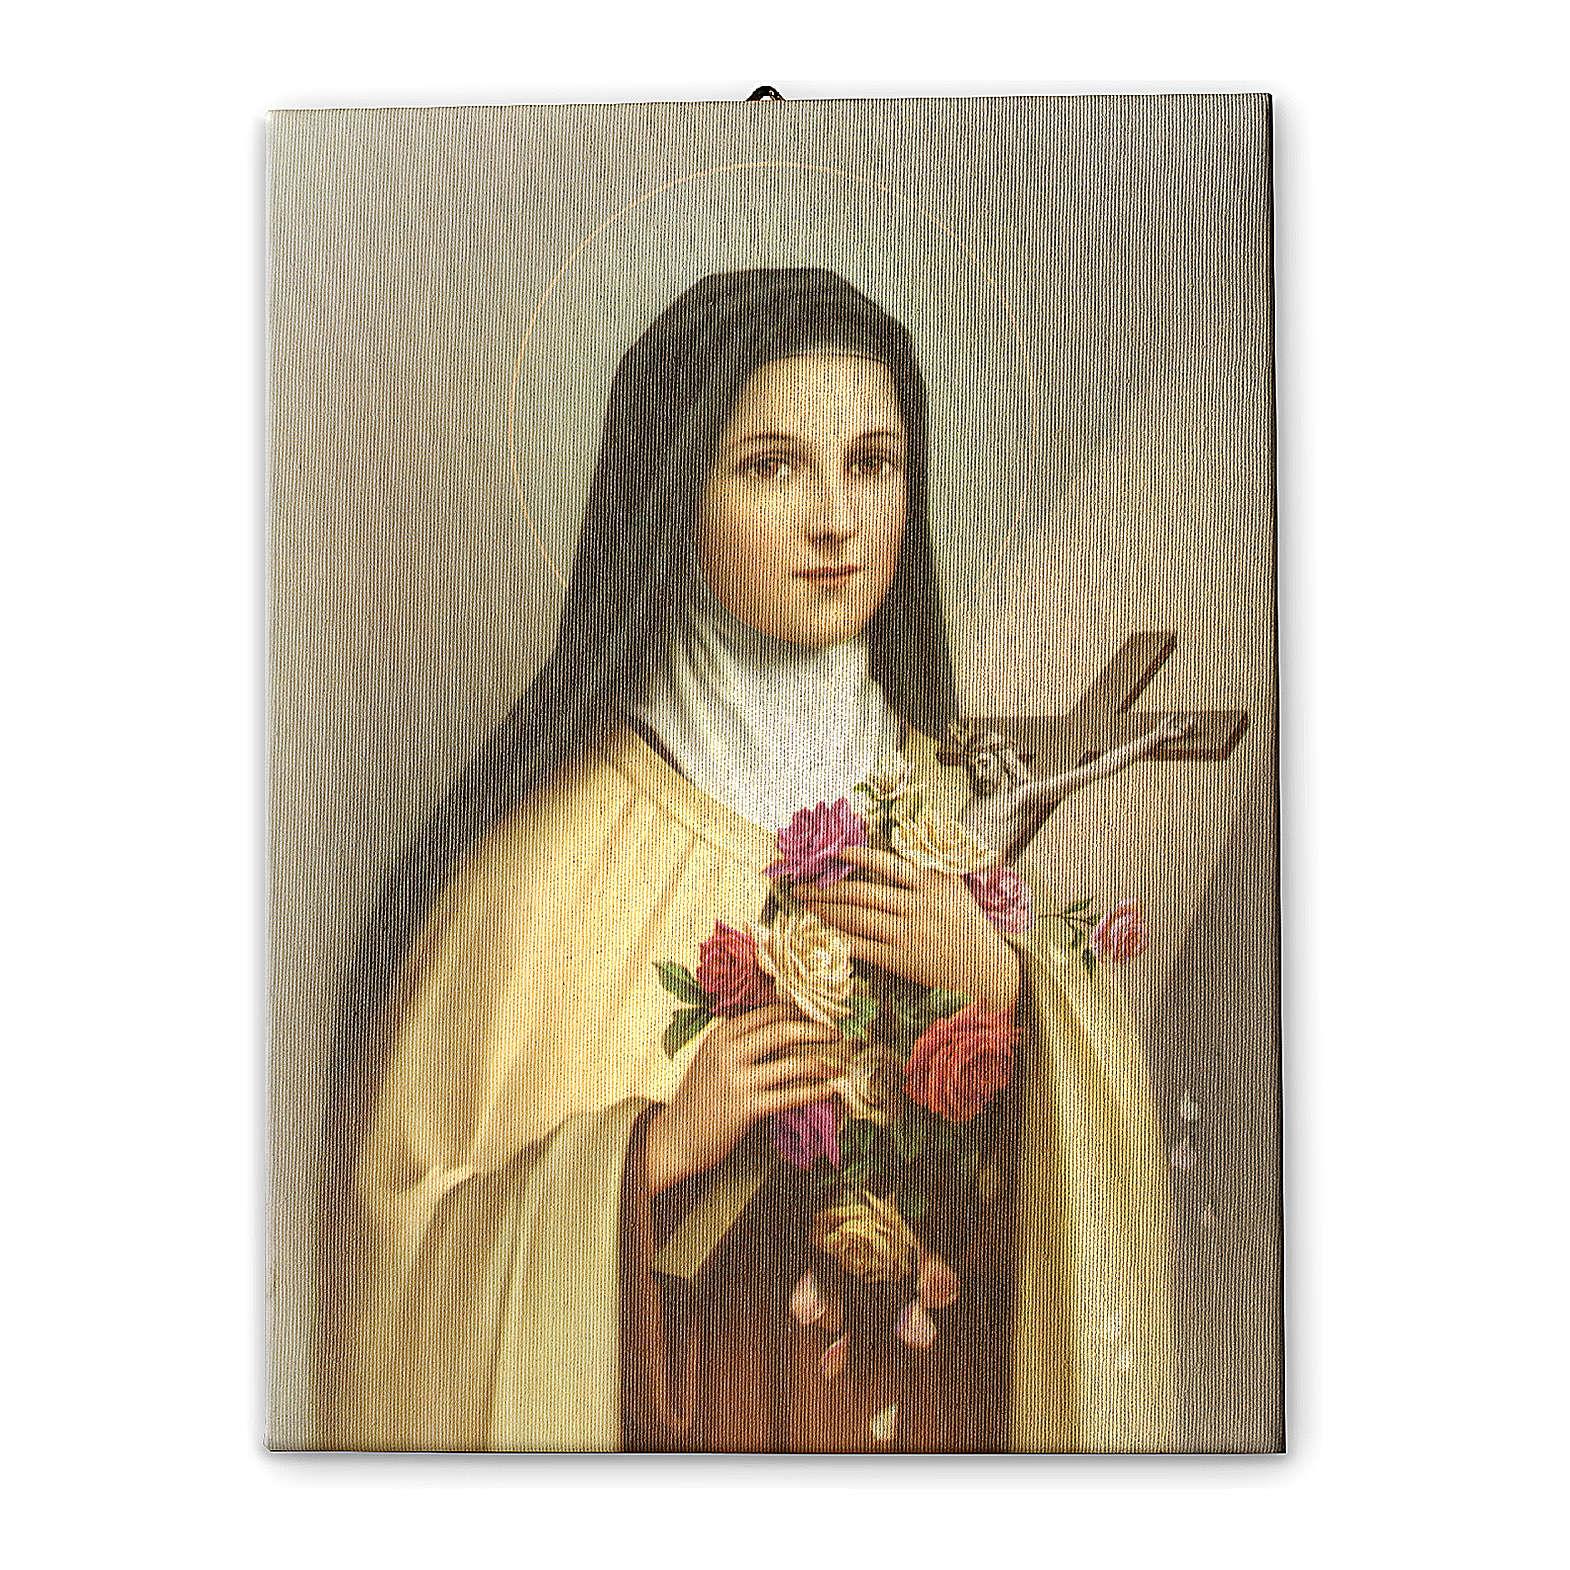 Cuadro sobre tela pictórica Santa Teresa del Niño Jesús 70x50 cm 3